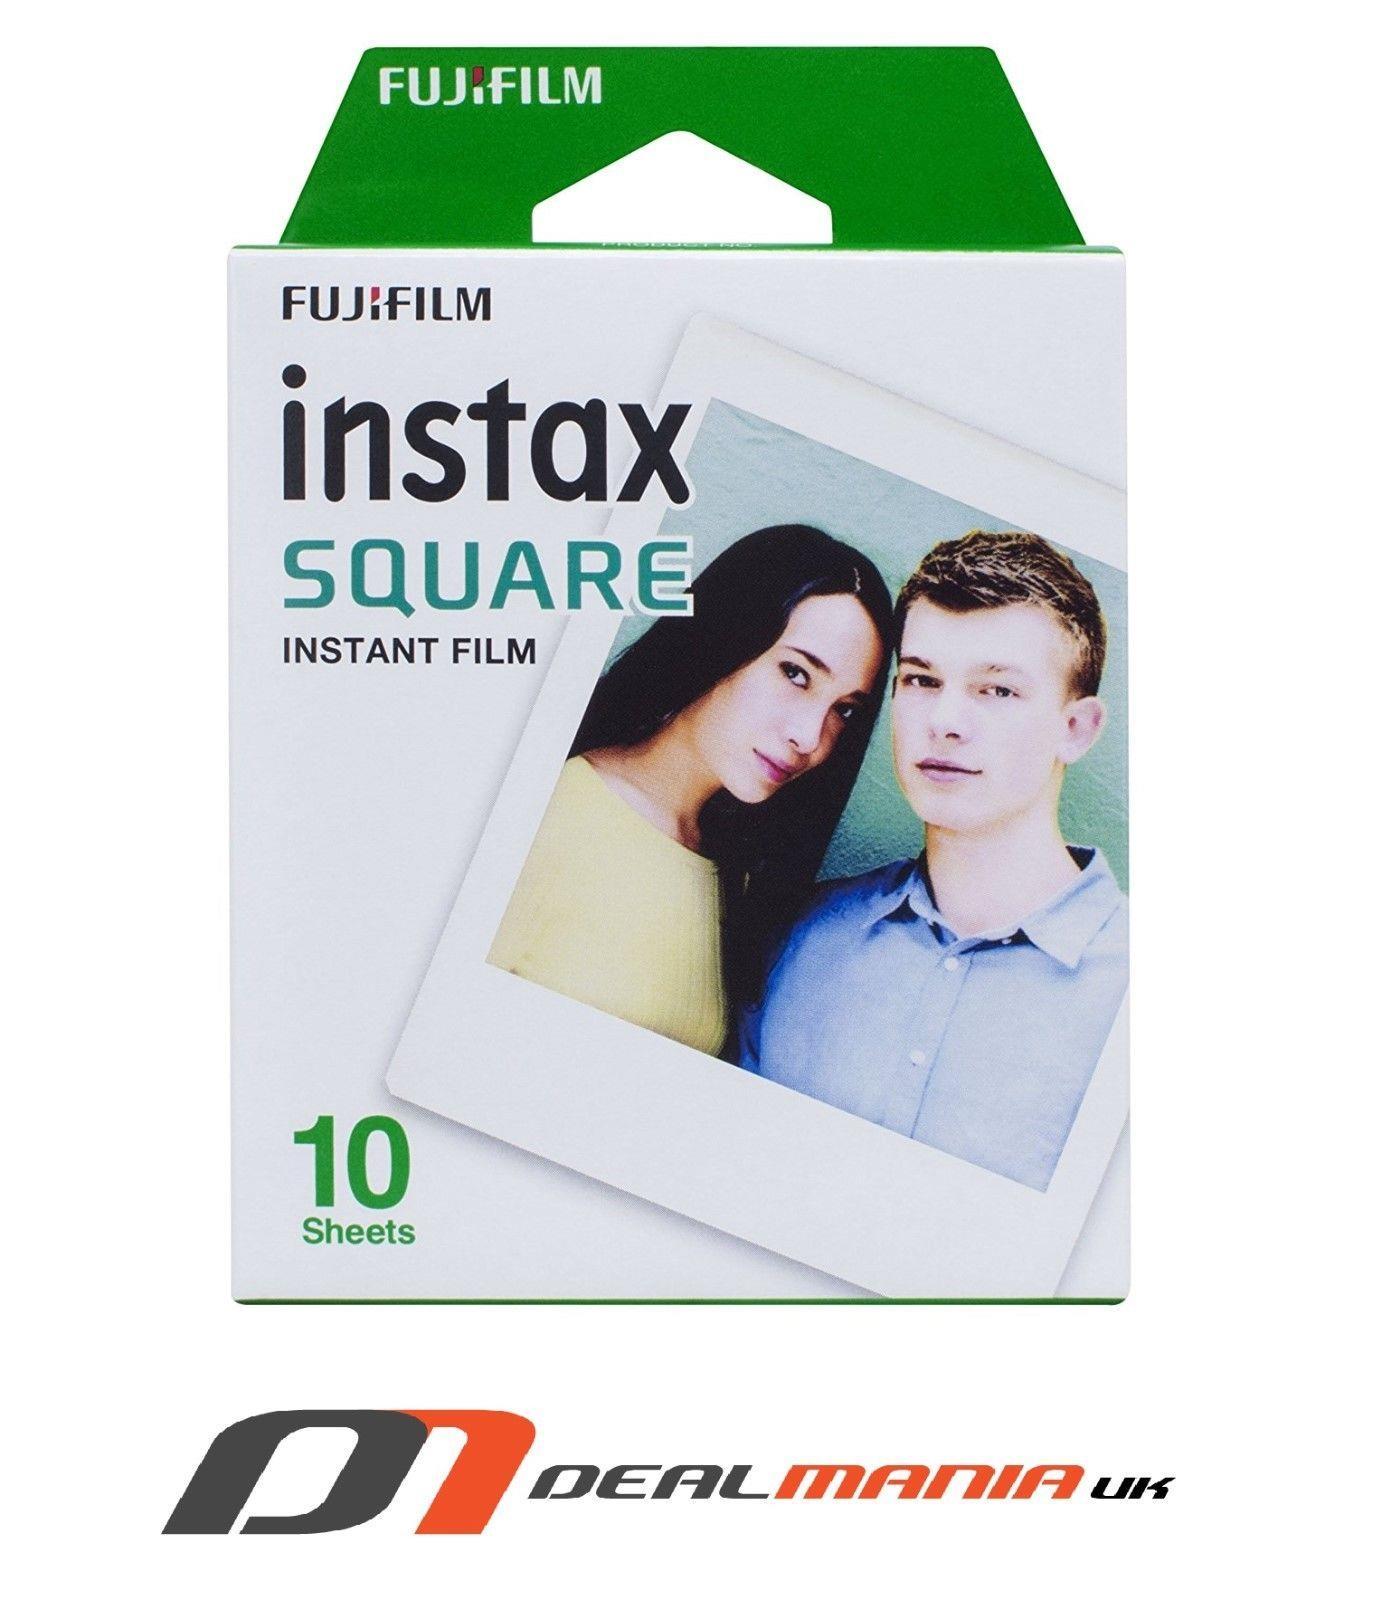 Fujifilm Instax Square Sq10 Instant Film White Pack Of 10 Paper Single